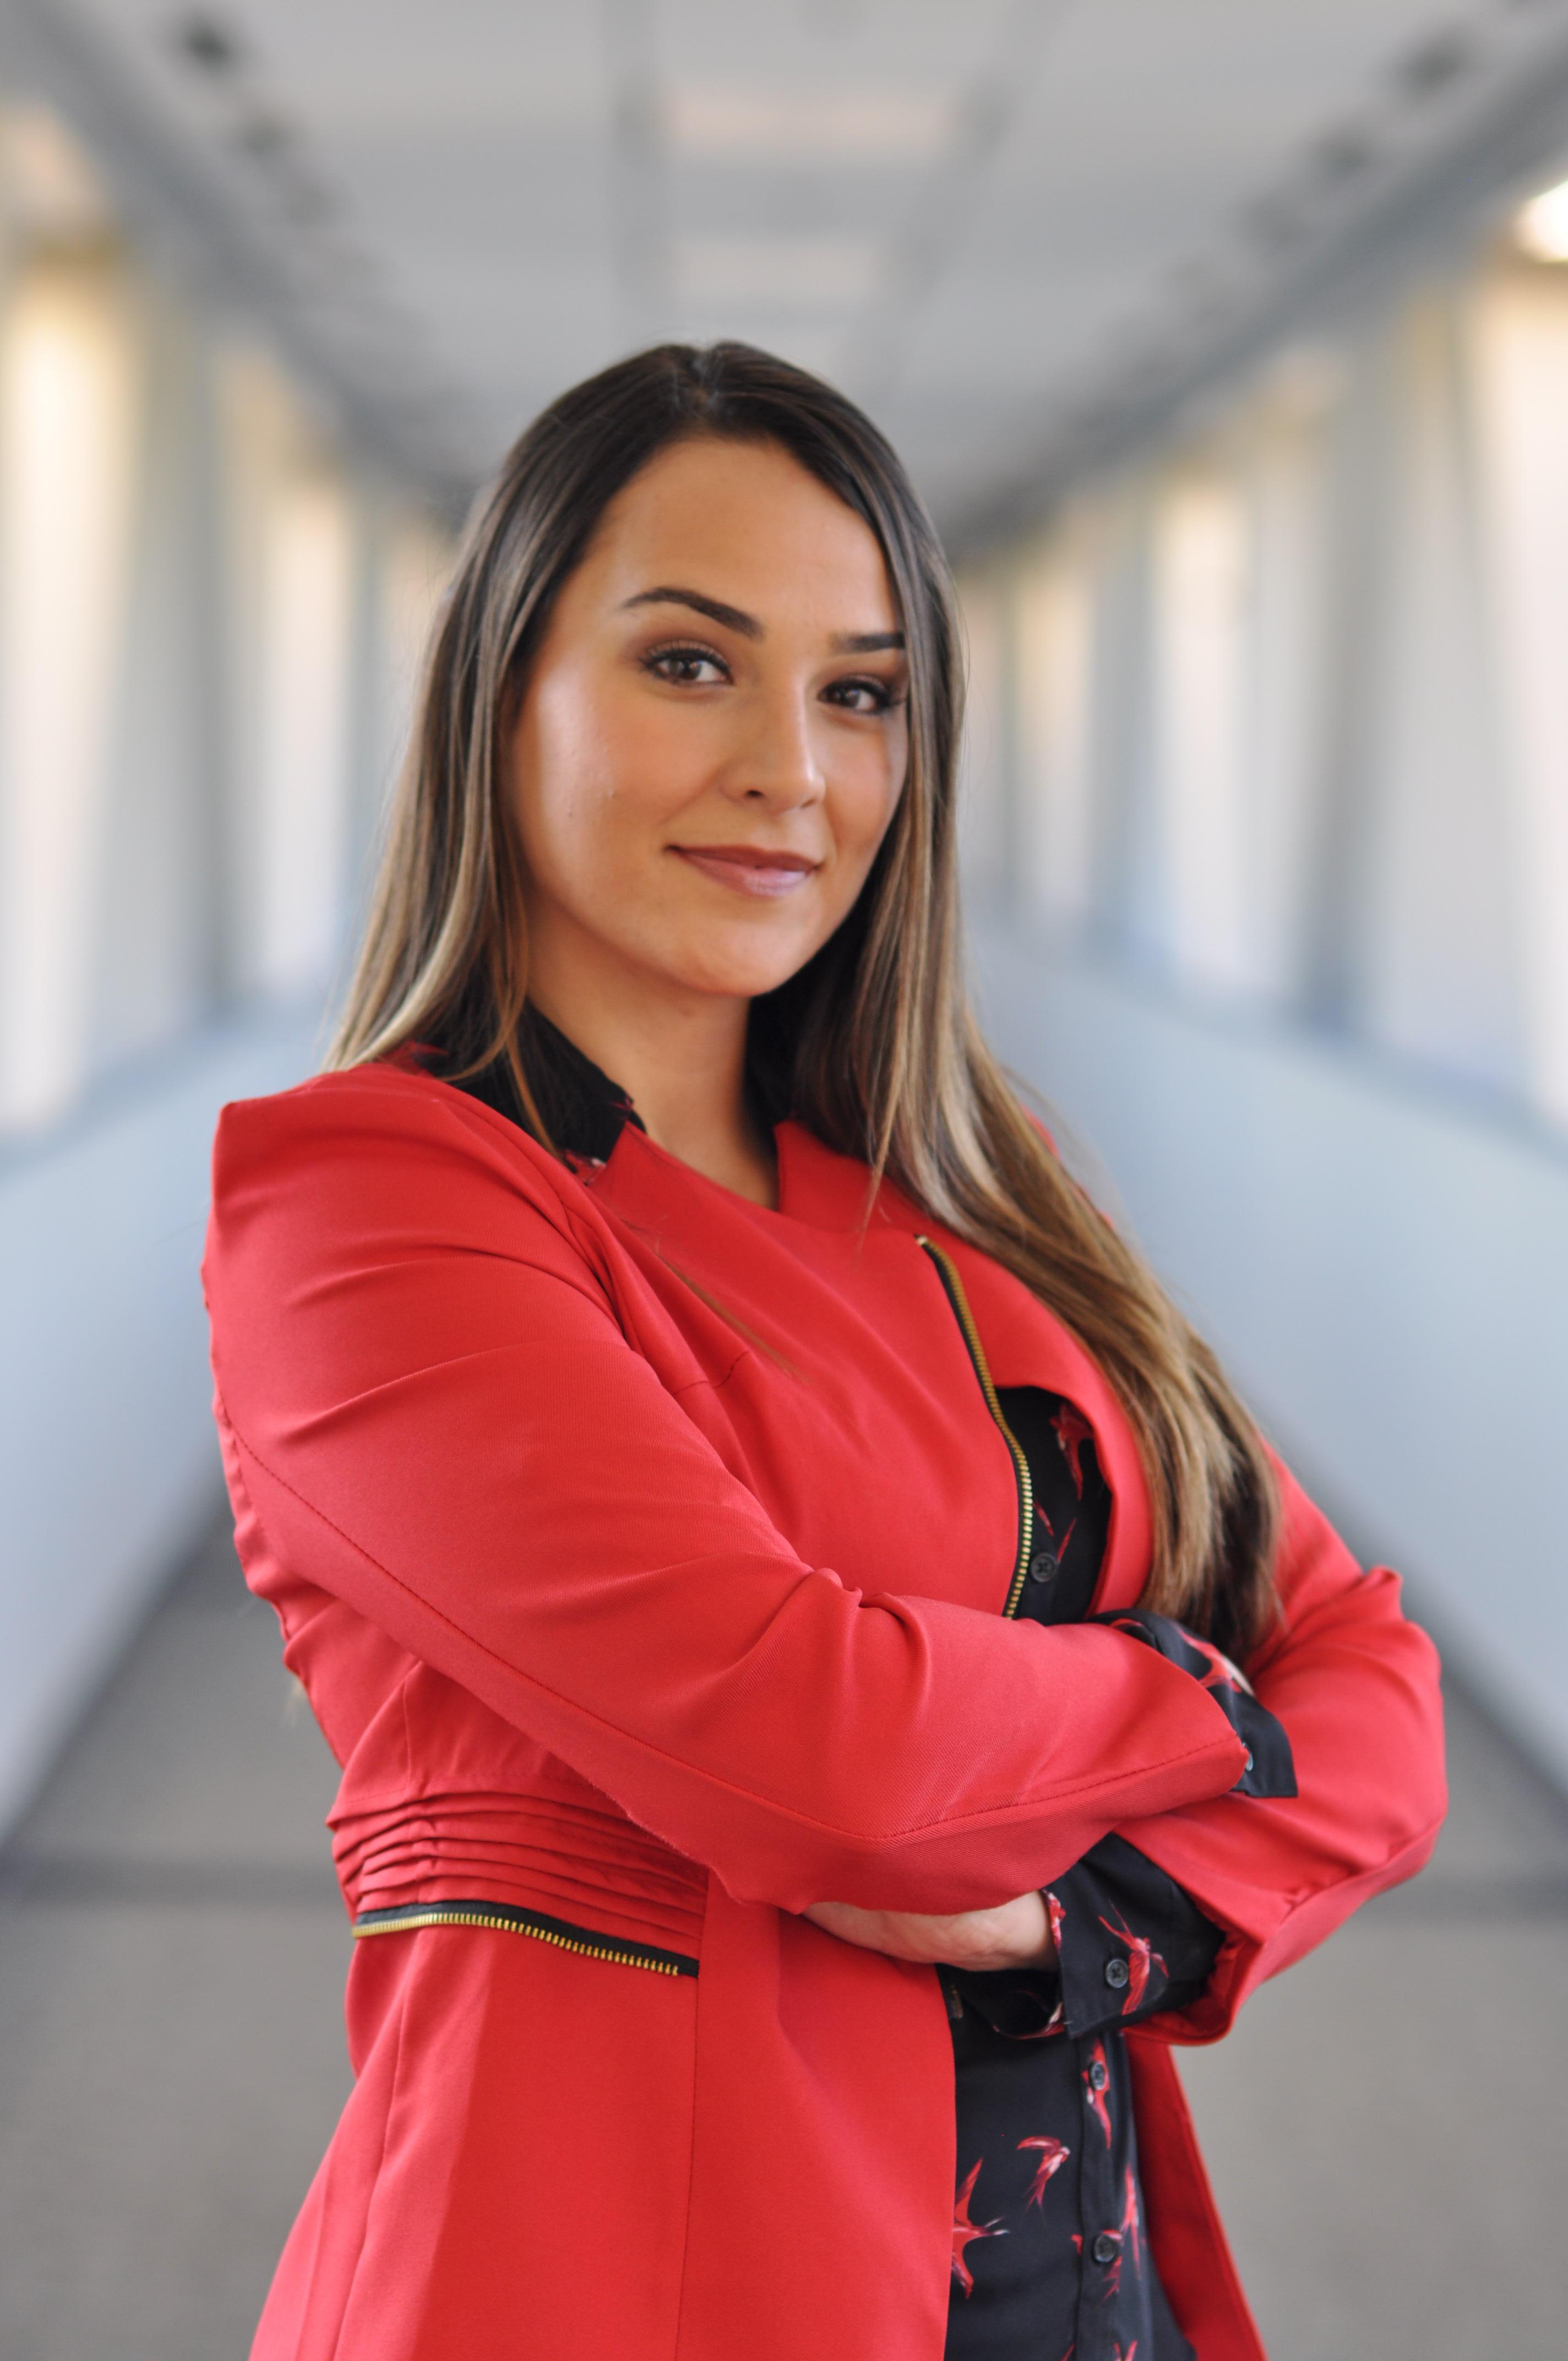 Juanita Velez, Multicultural Marketing Expert and Founder of HYPE